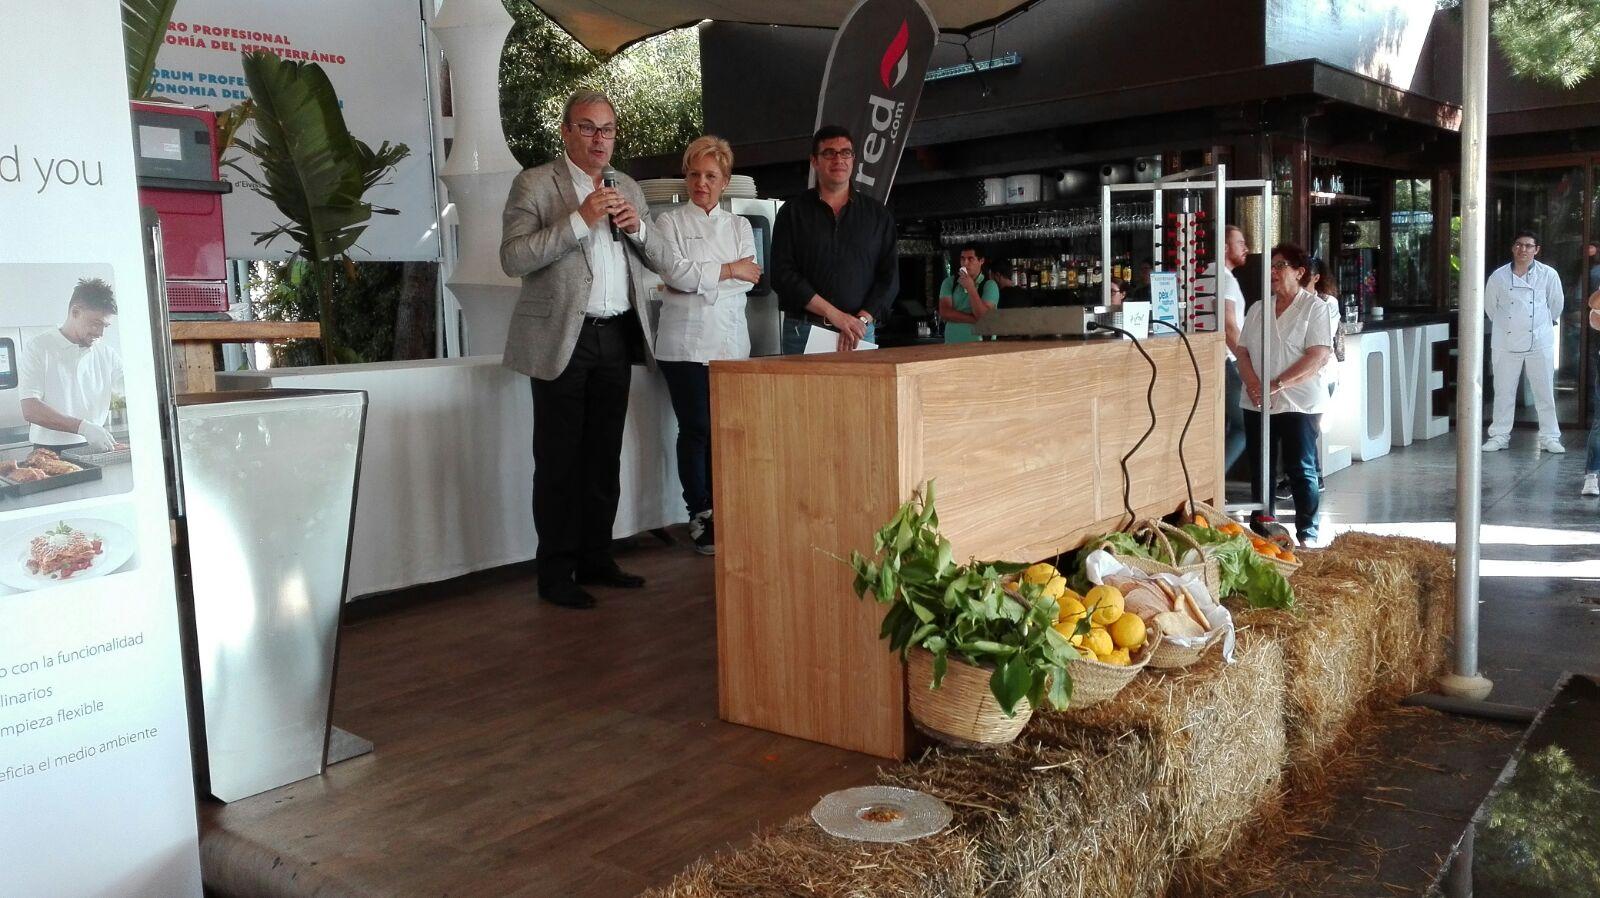 I forum gastronomia